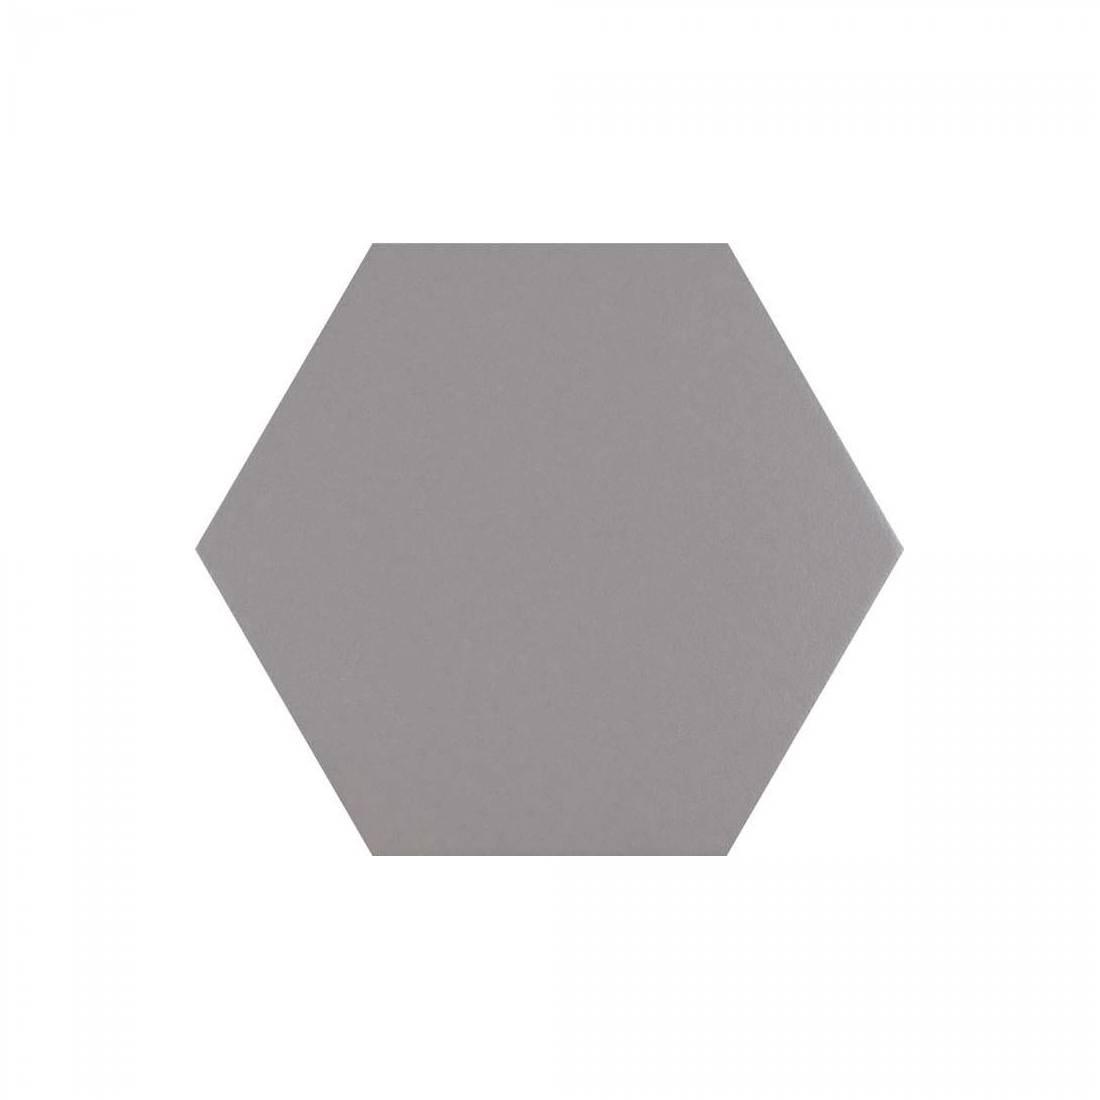 Basic Hex 25 Grey Matt 1